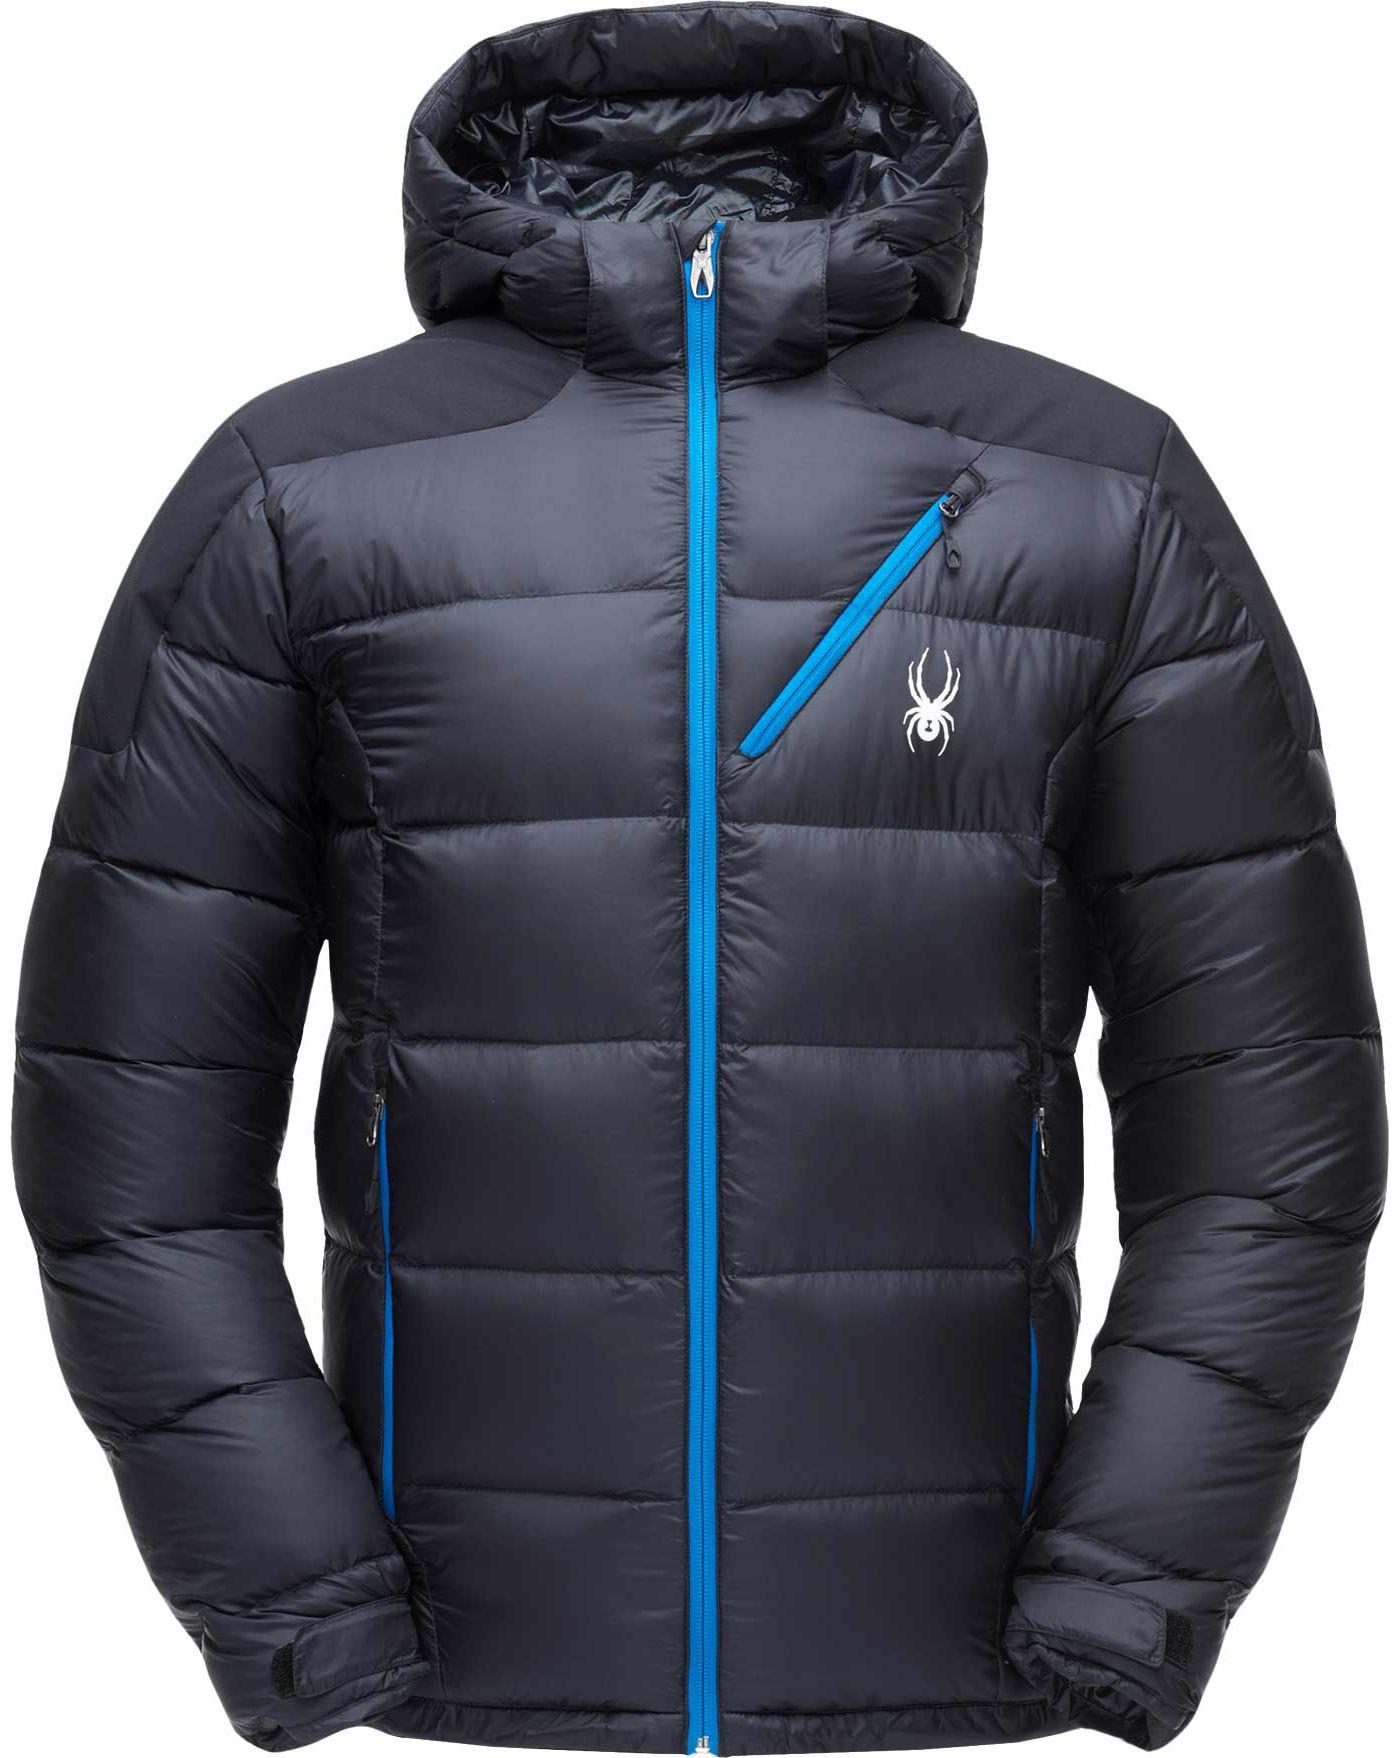 Spyder Men's Eiger Down Jacket